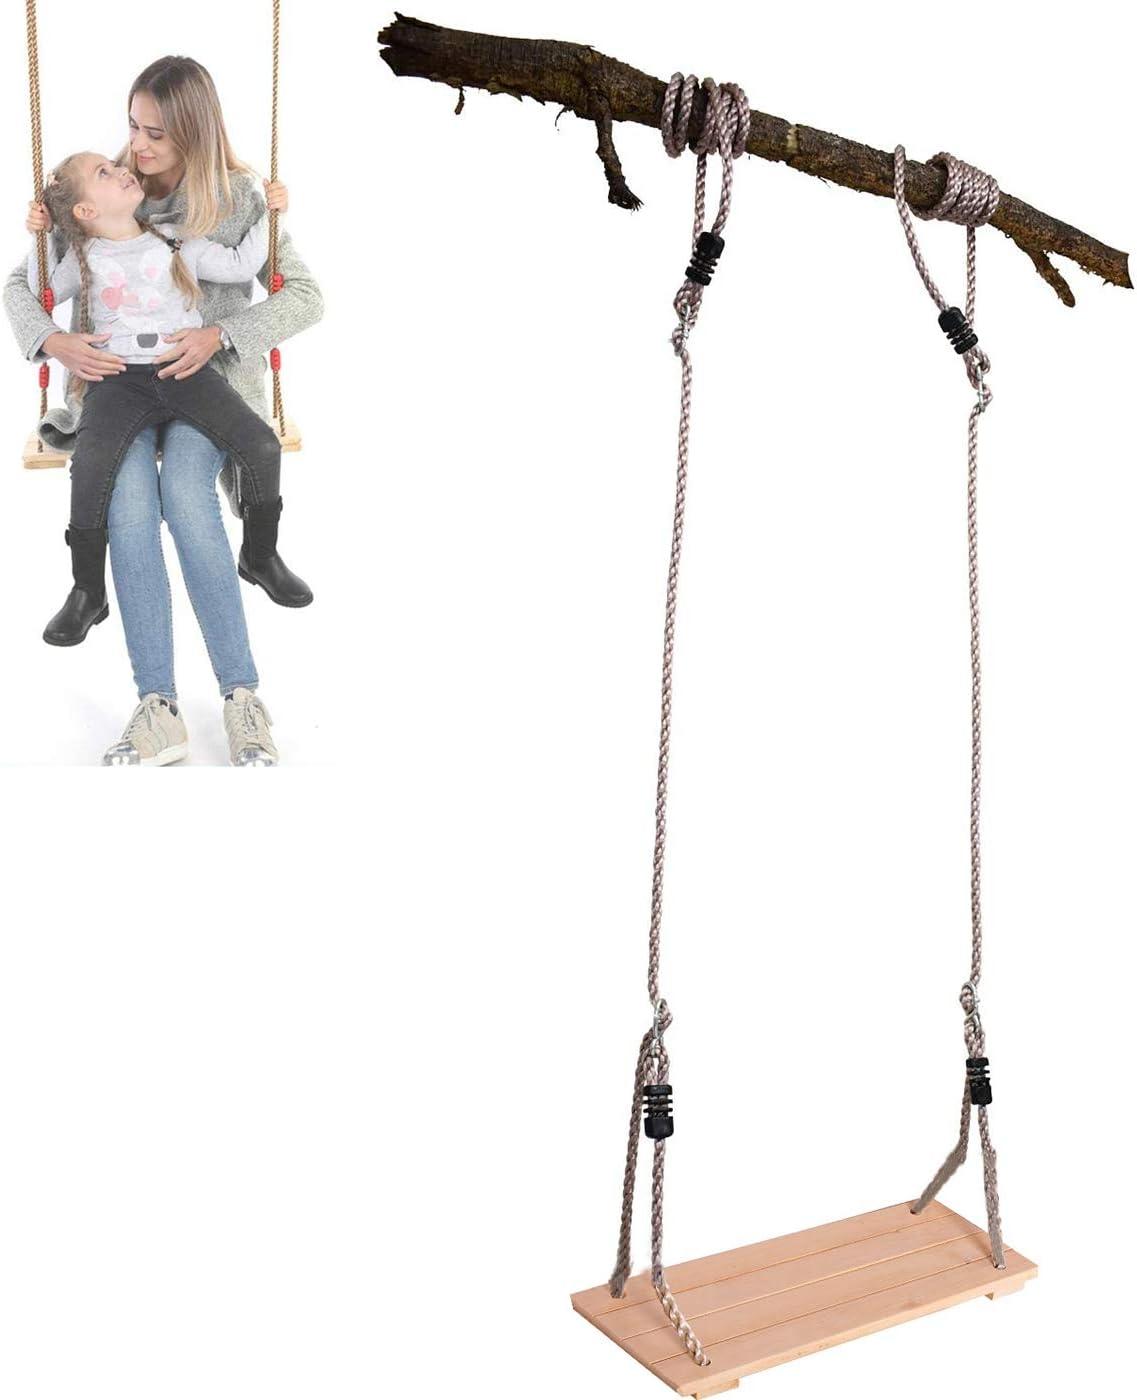 Enweonga Antiseptic Wooden Swing Seat for Kids, 150kg Load, Outdoor Baby Garden Swing Toy, Trapeze Swing Hammock Bench